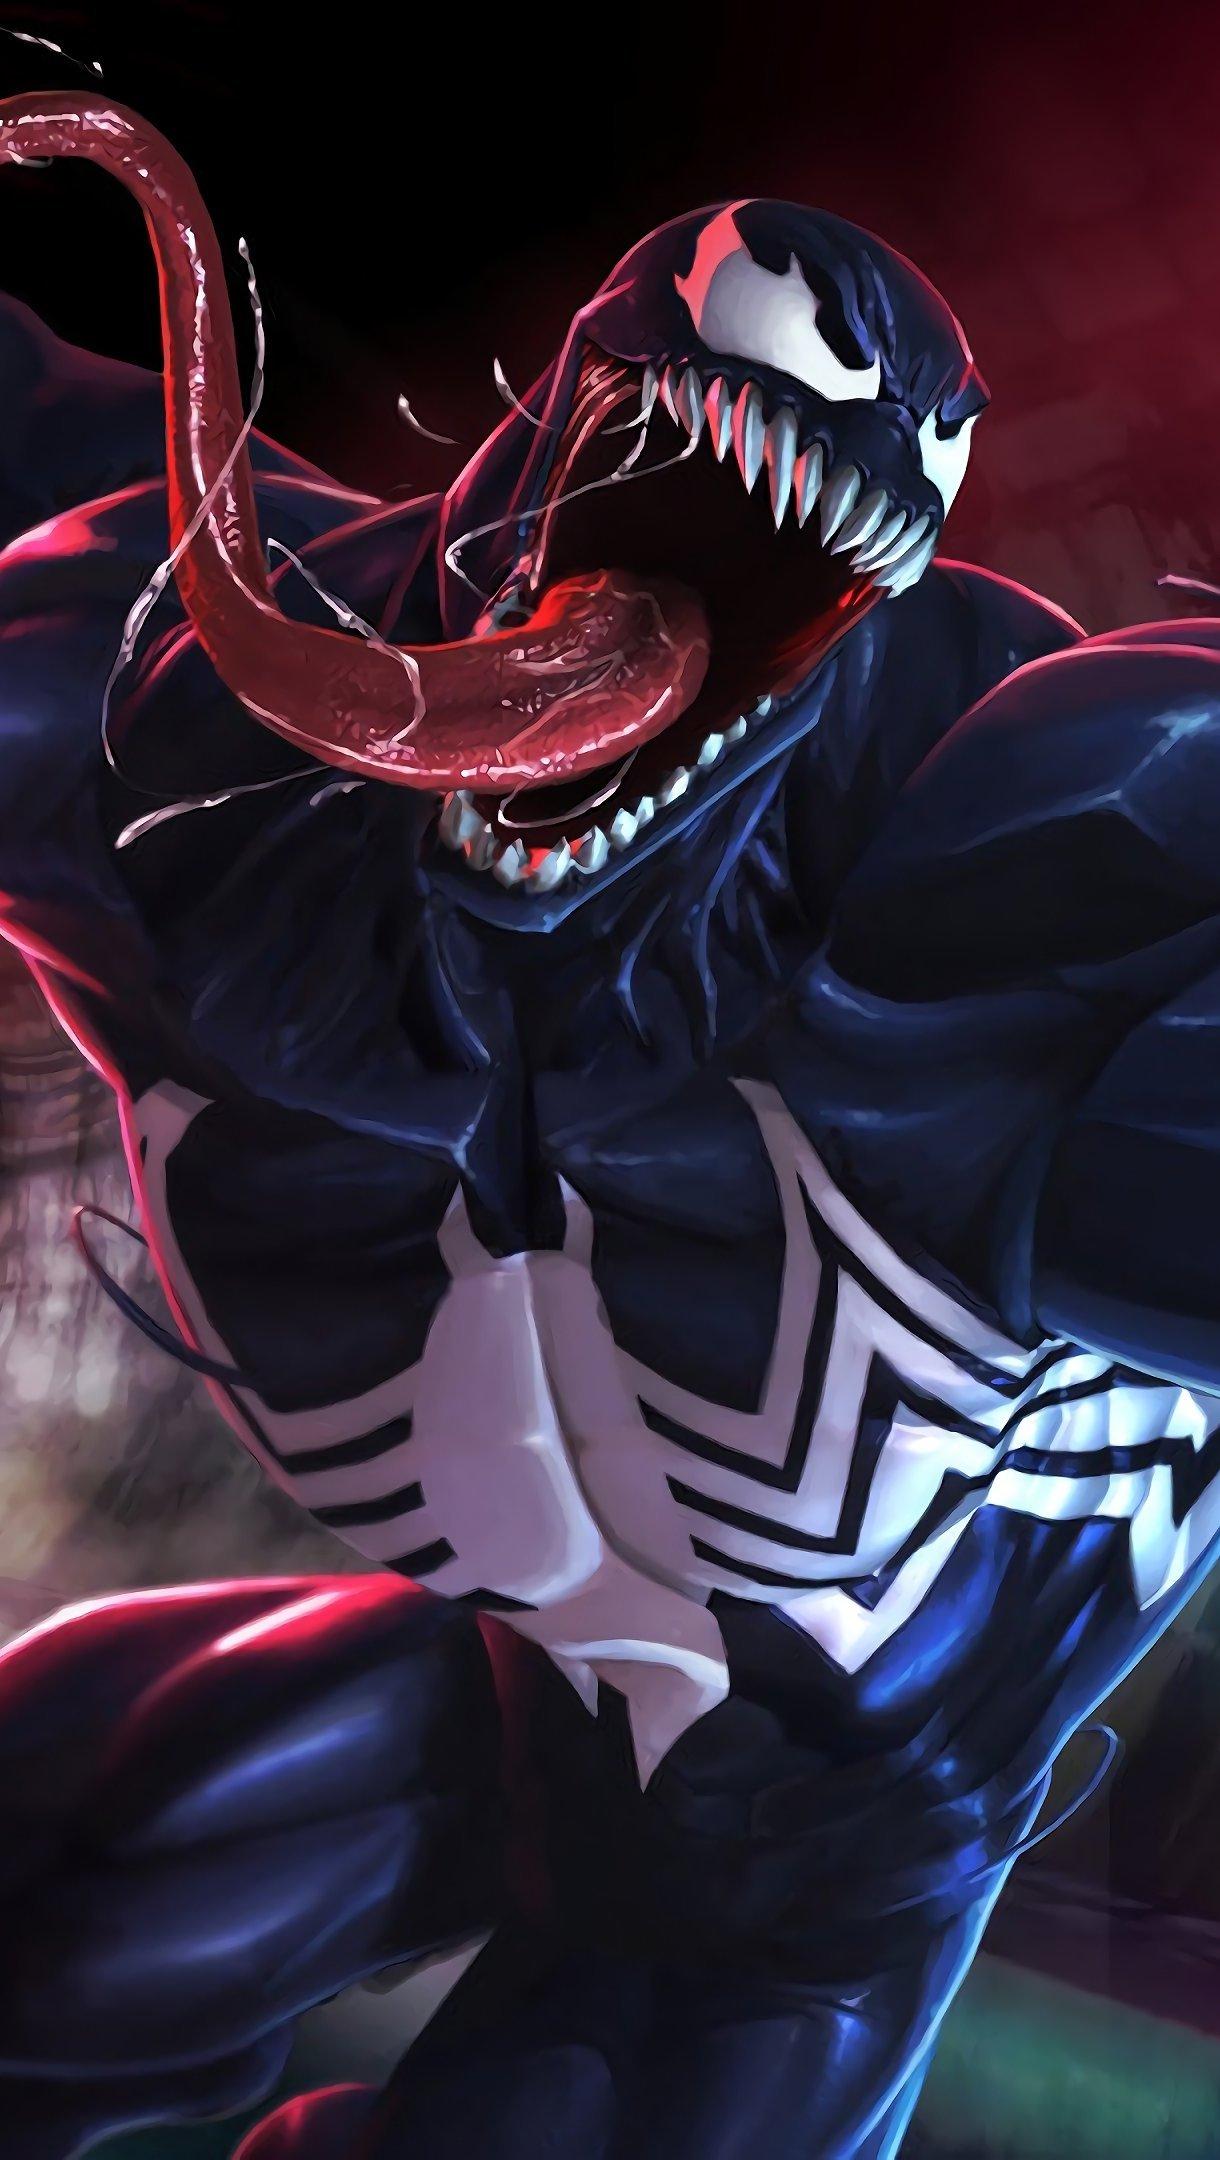 Wallpaper Venom Vertical